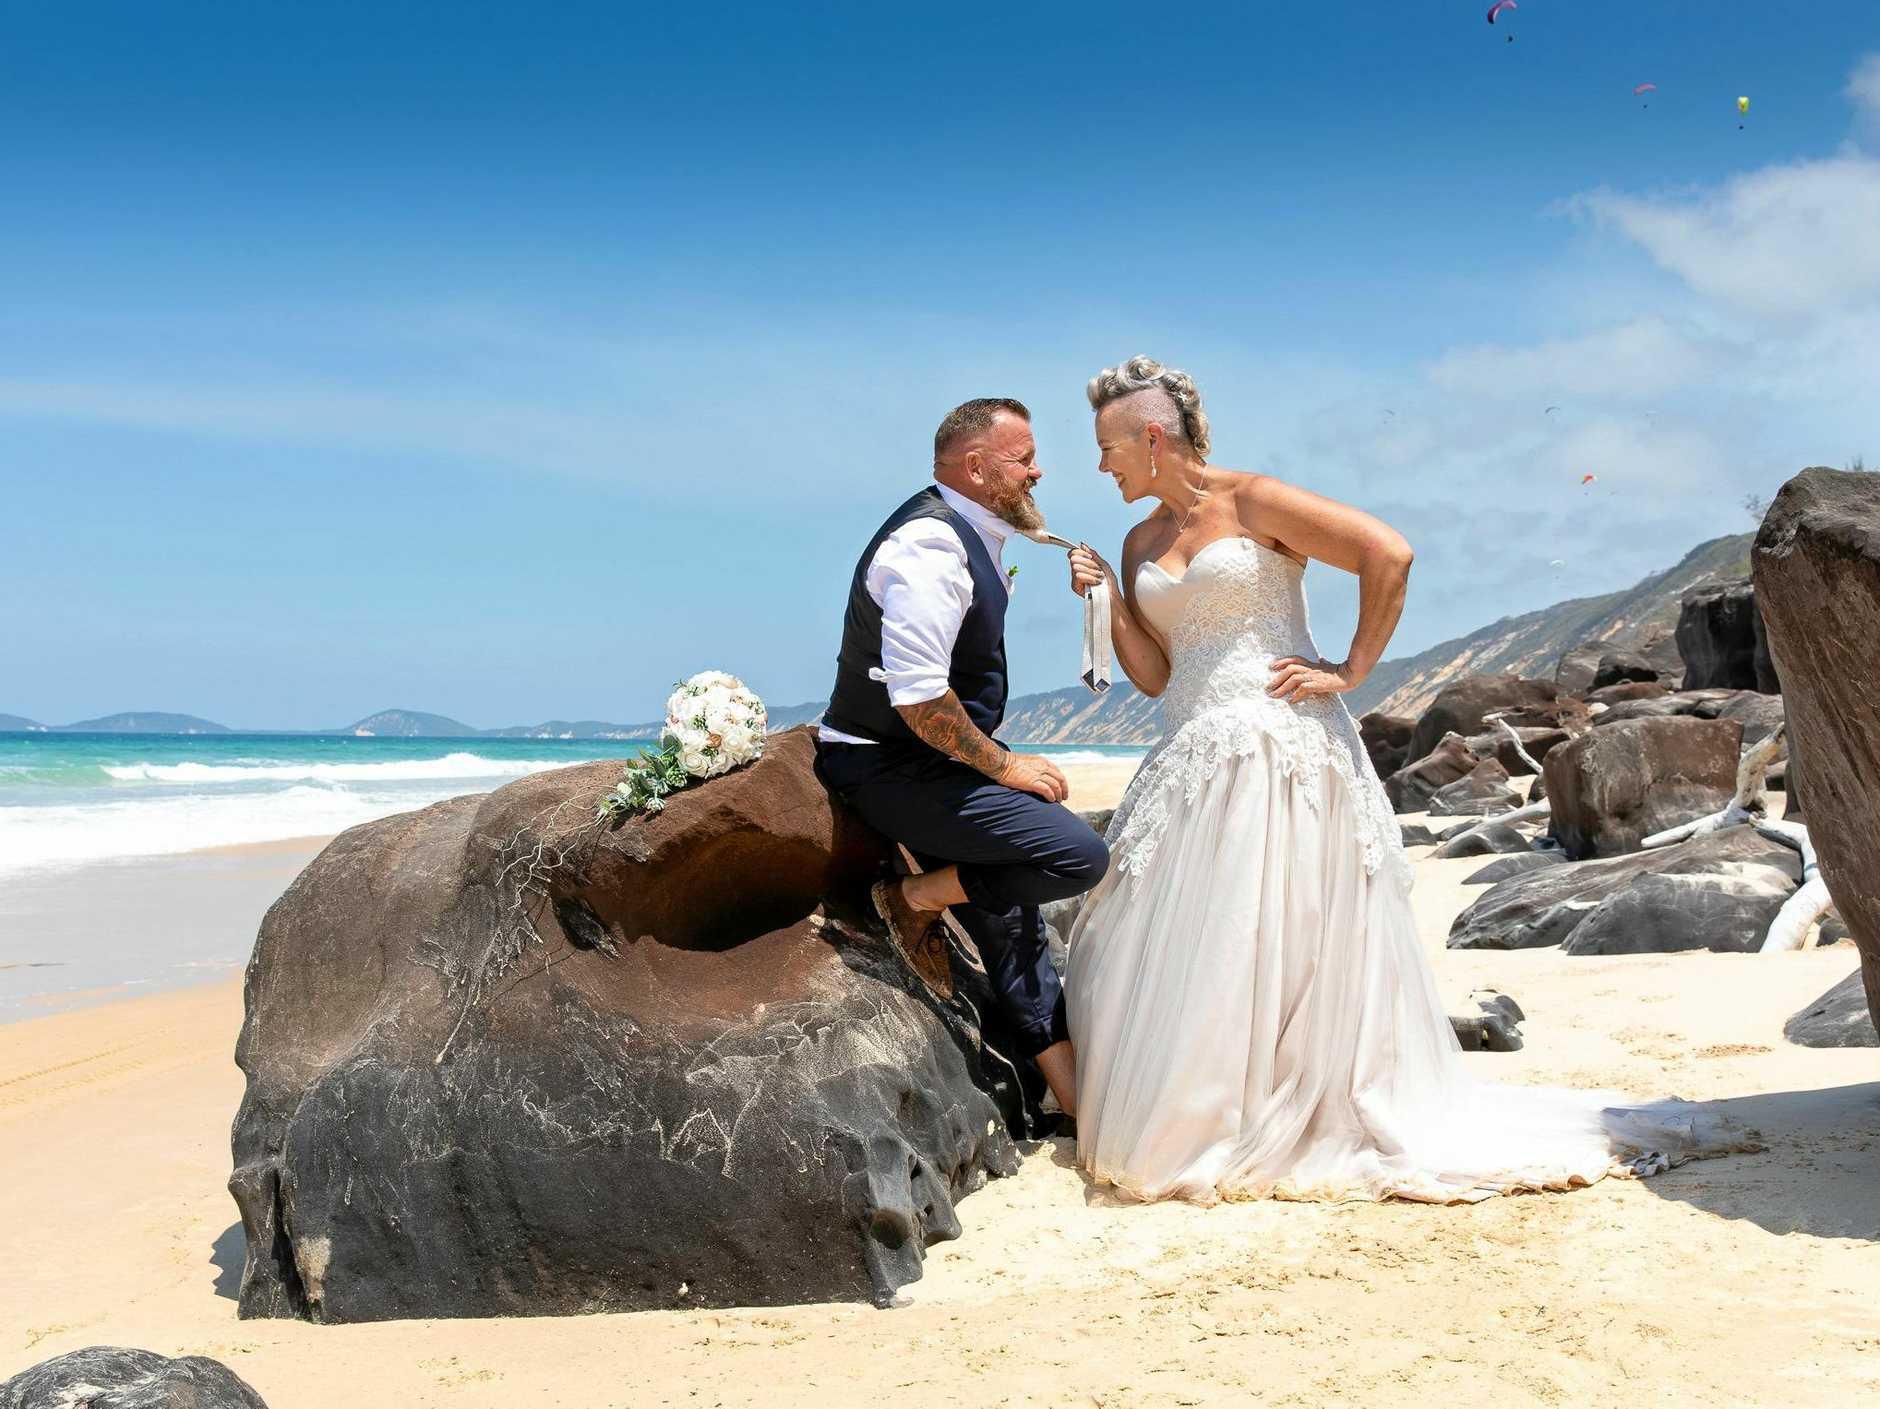 Craig and Sonya Partridge at their wedding at Rainbow Beach.